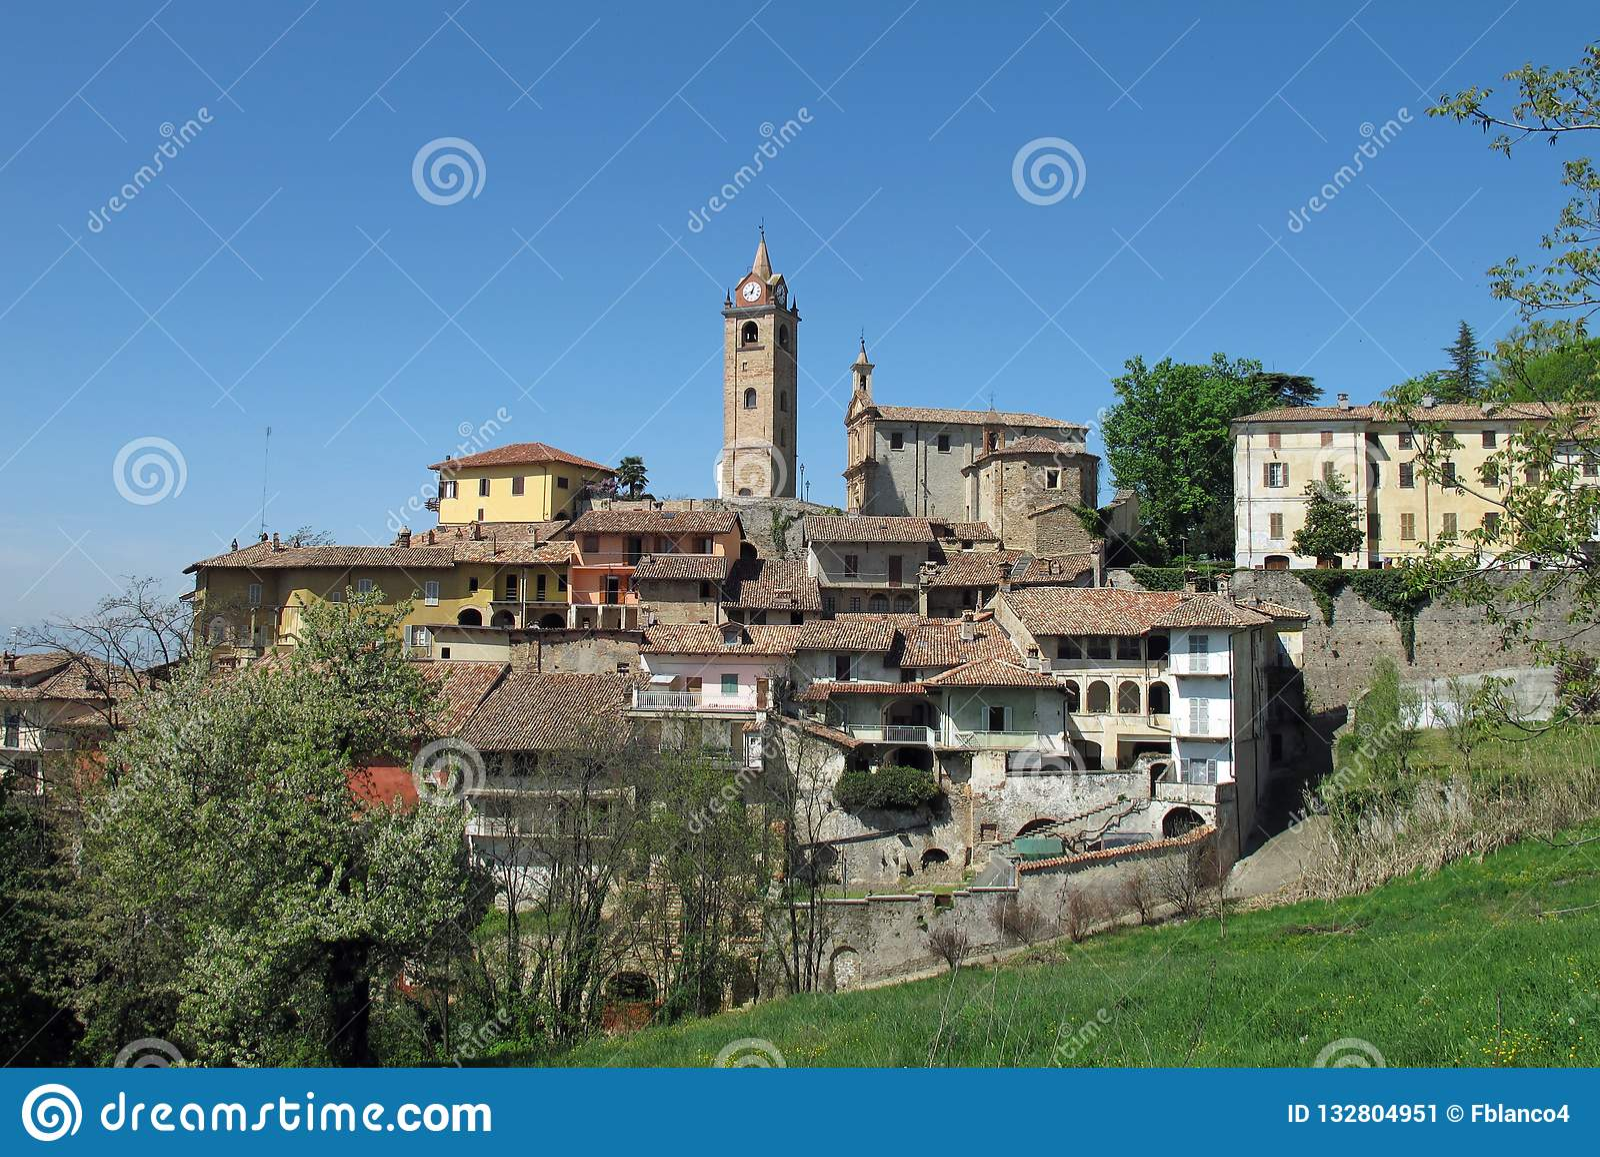 Monforte D 'album i den Piemonte vinregionen av nordliga Italien